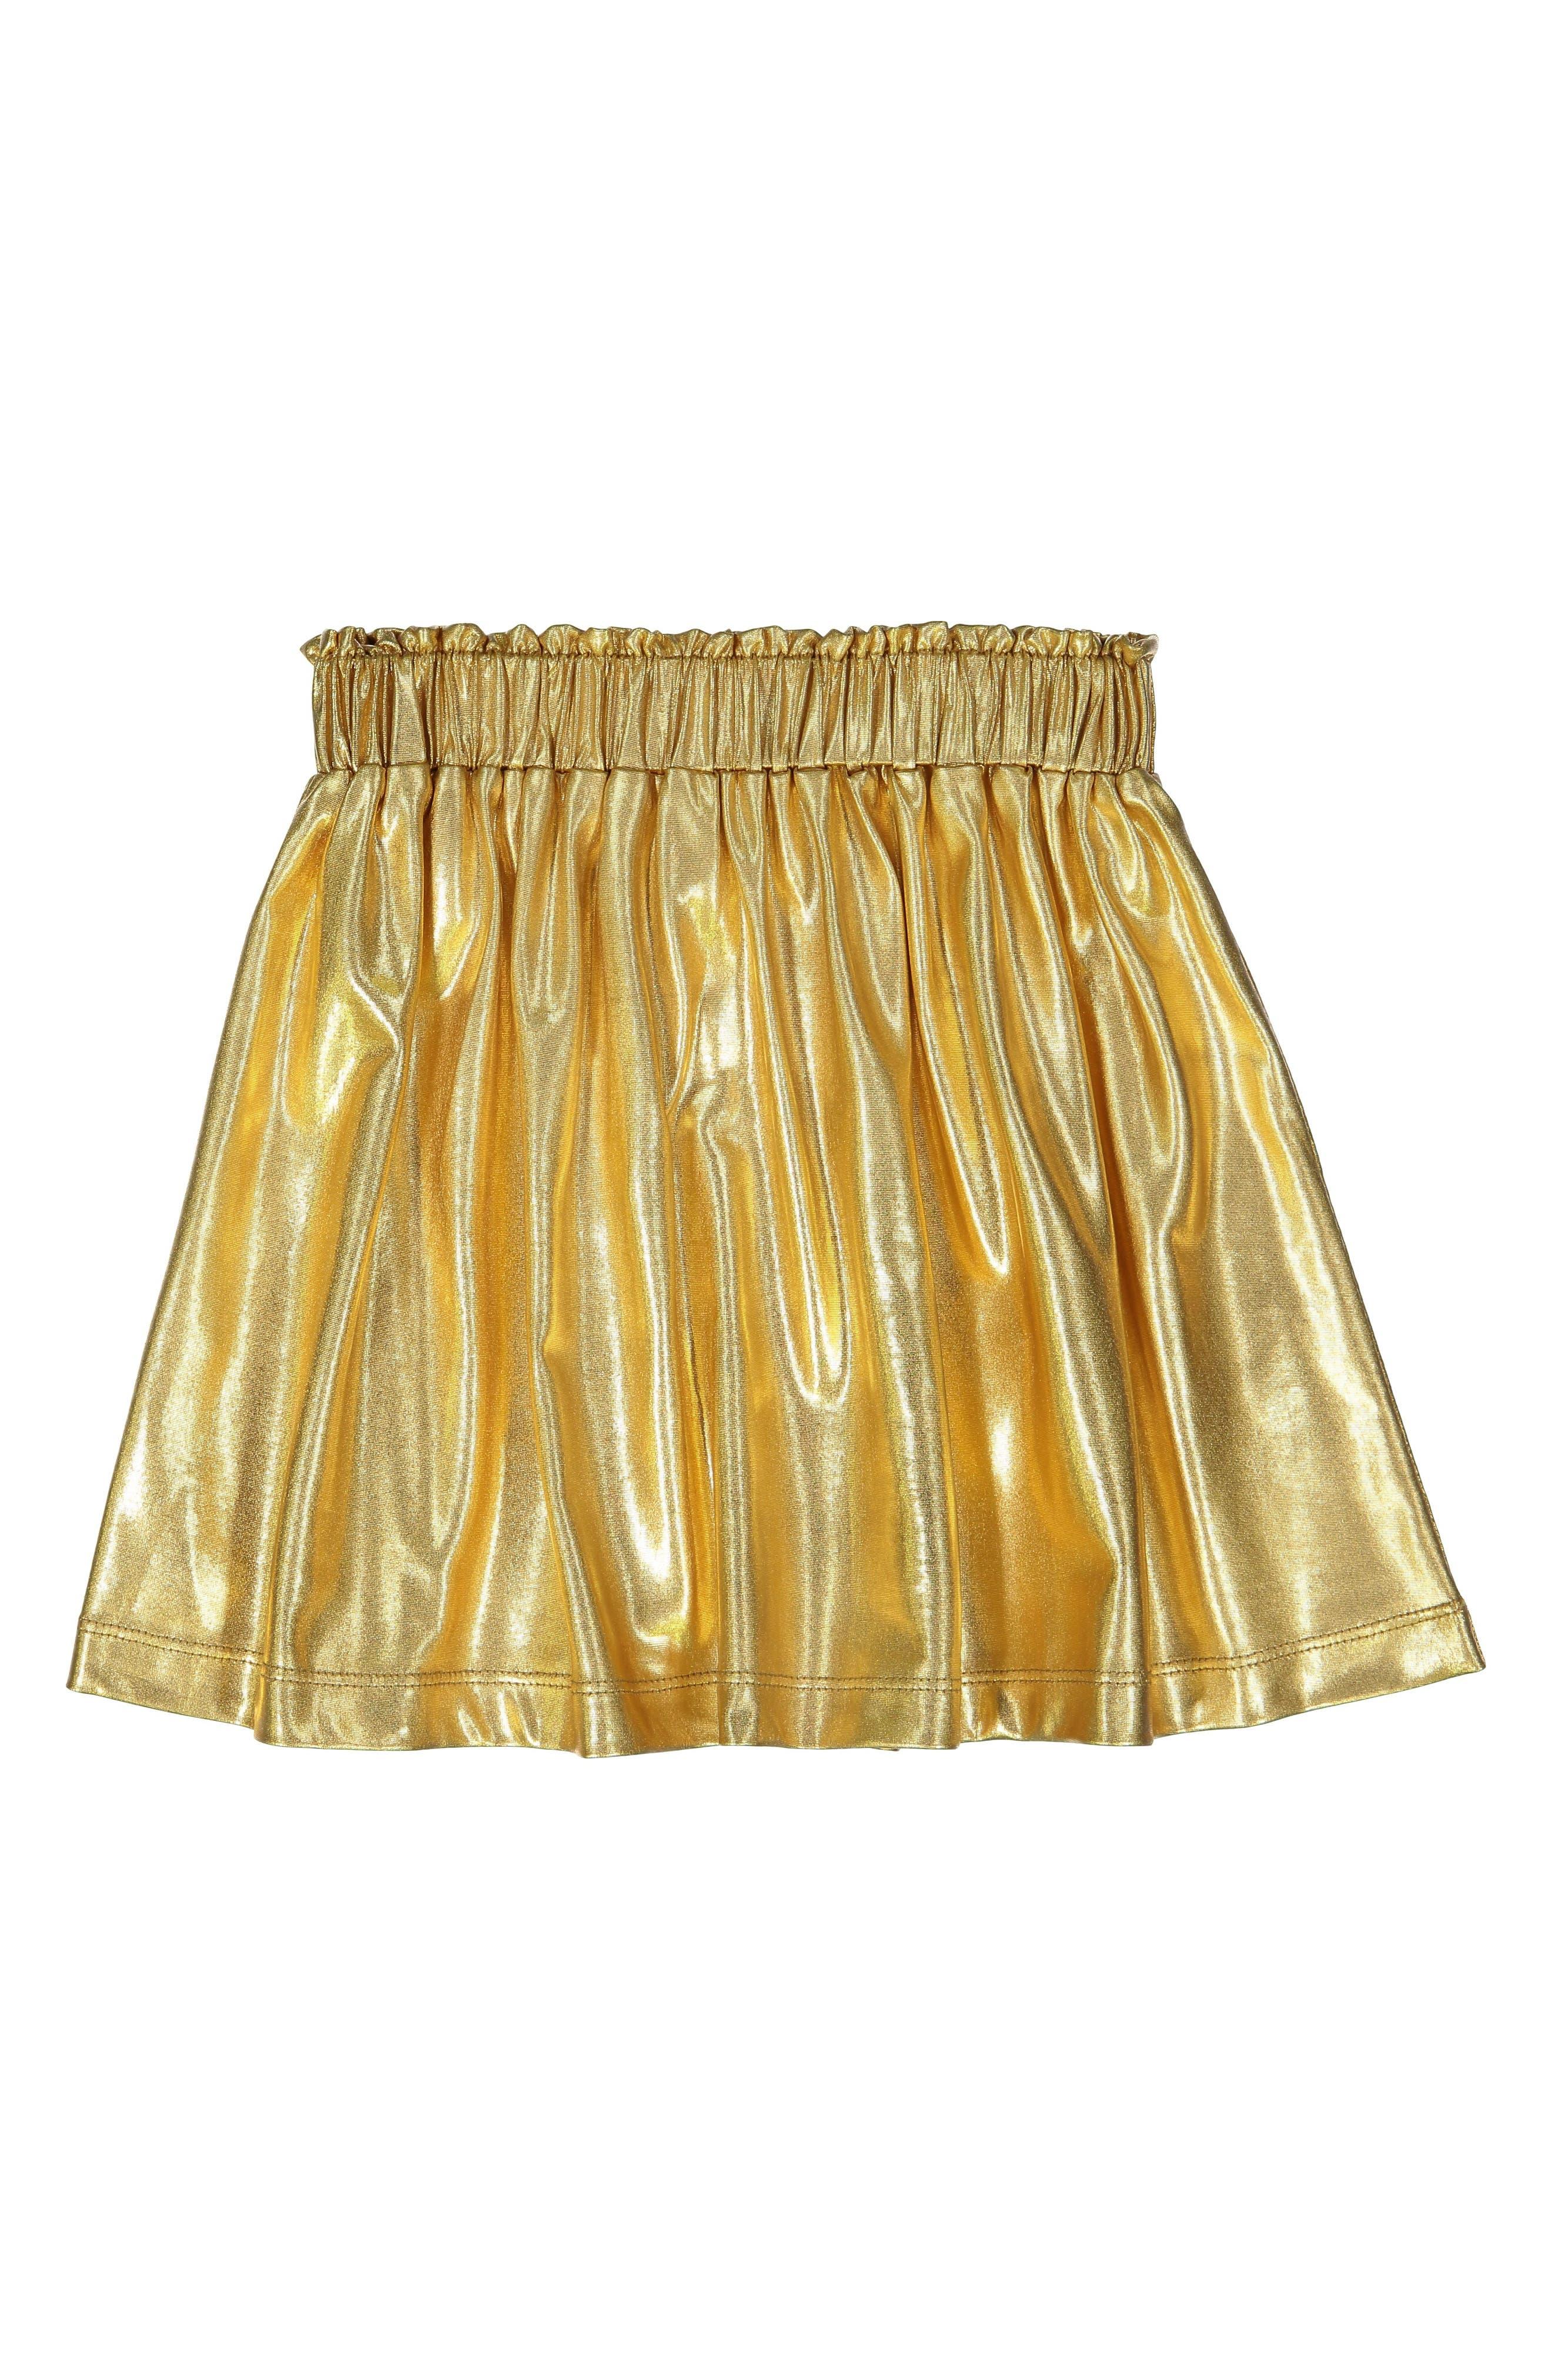 MASALA BABY, Gold Metallic Skirt, Main thumbnail 1, color, GOLD